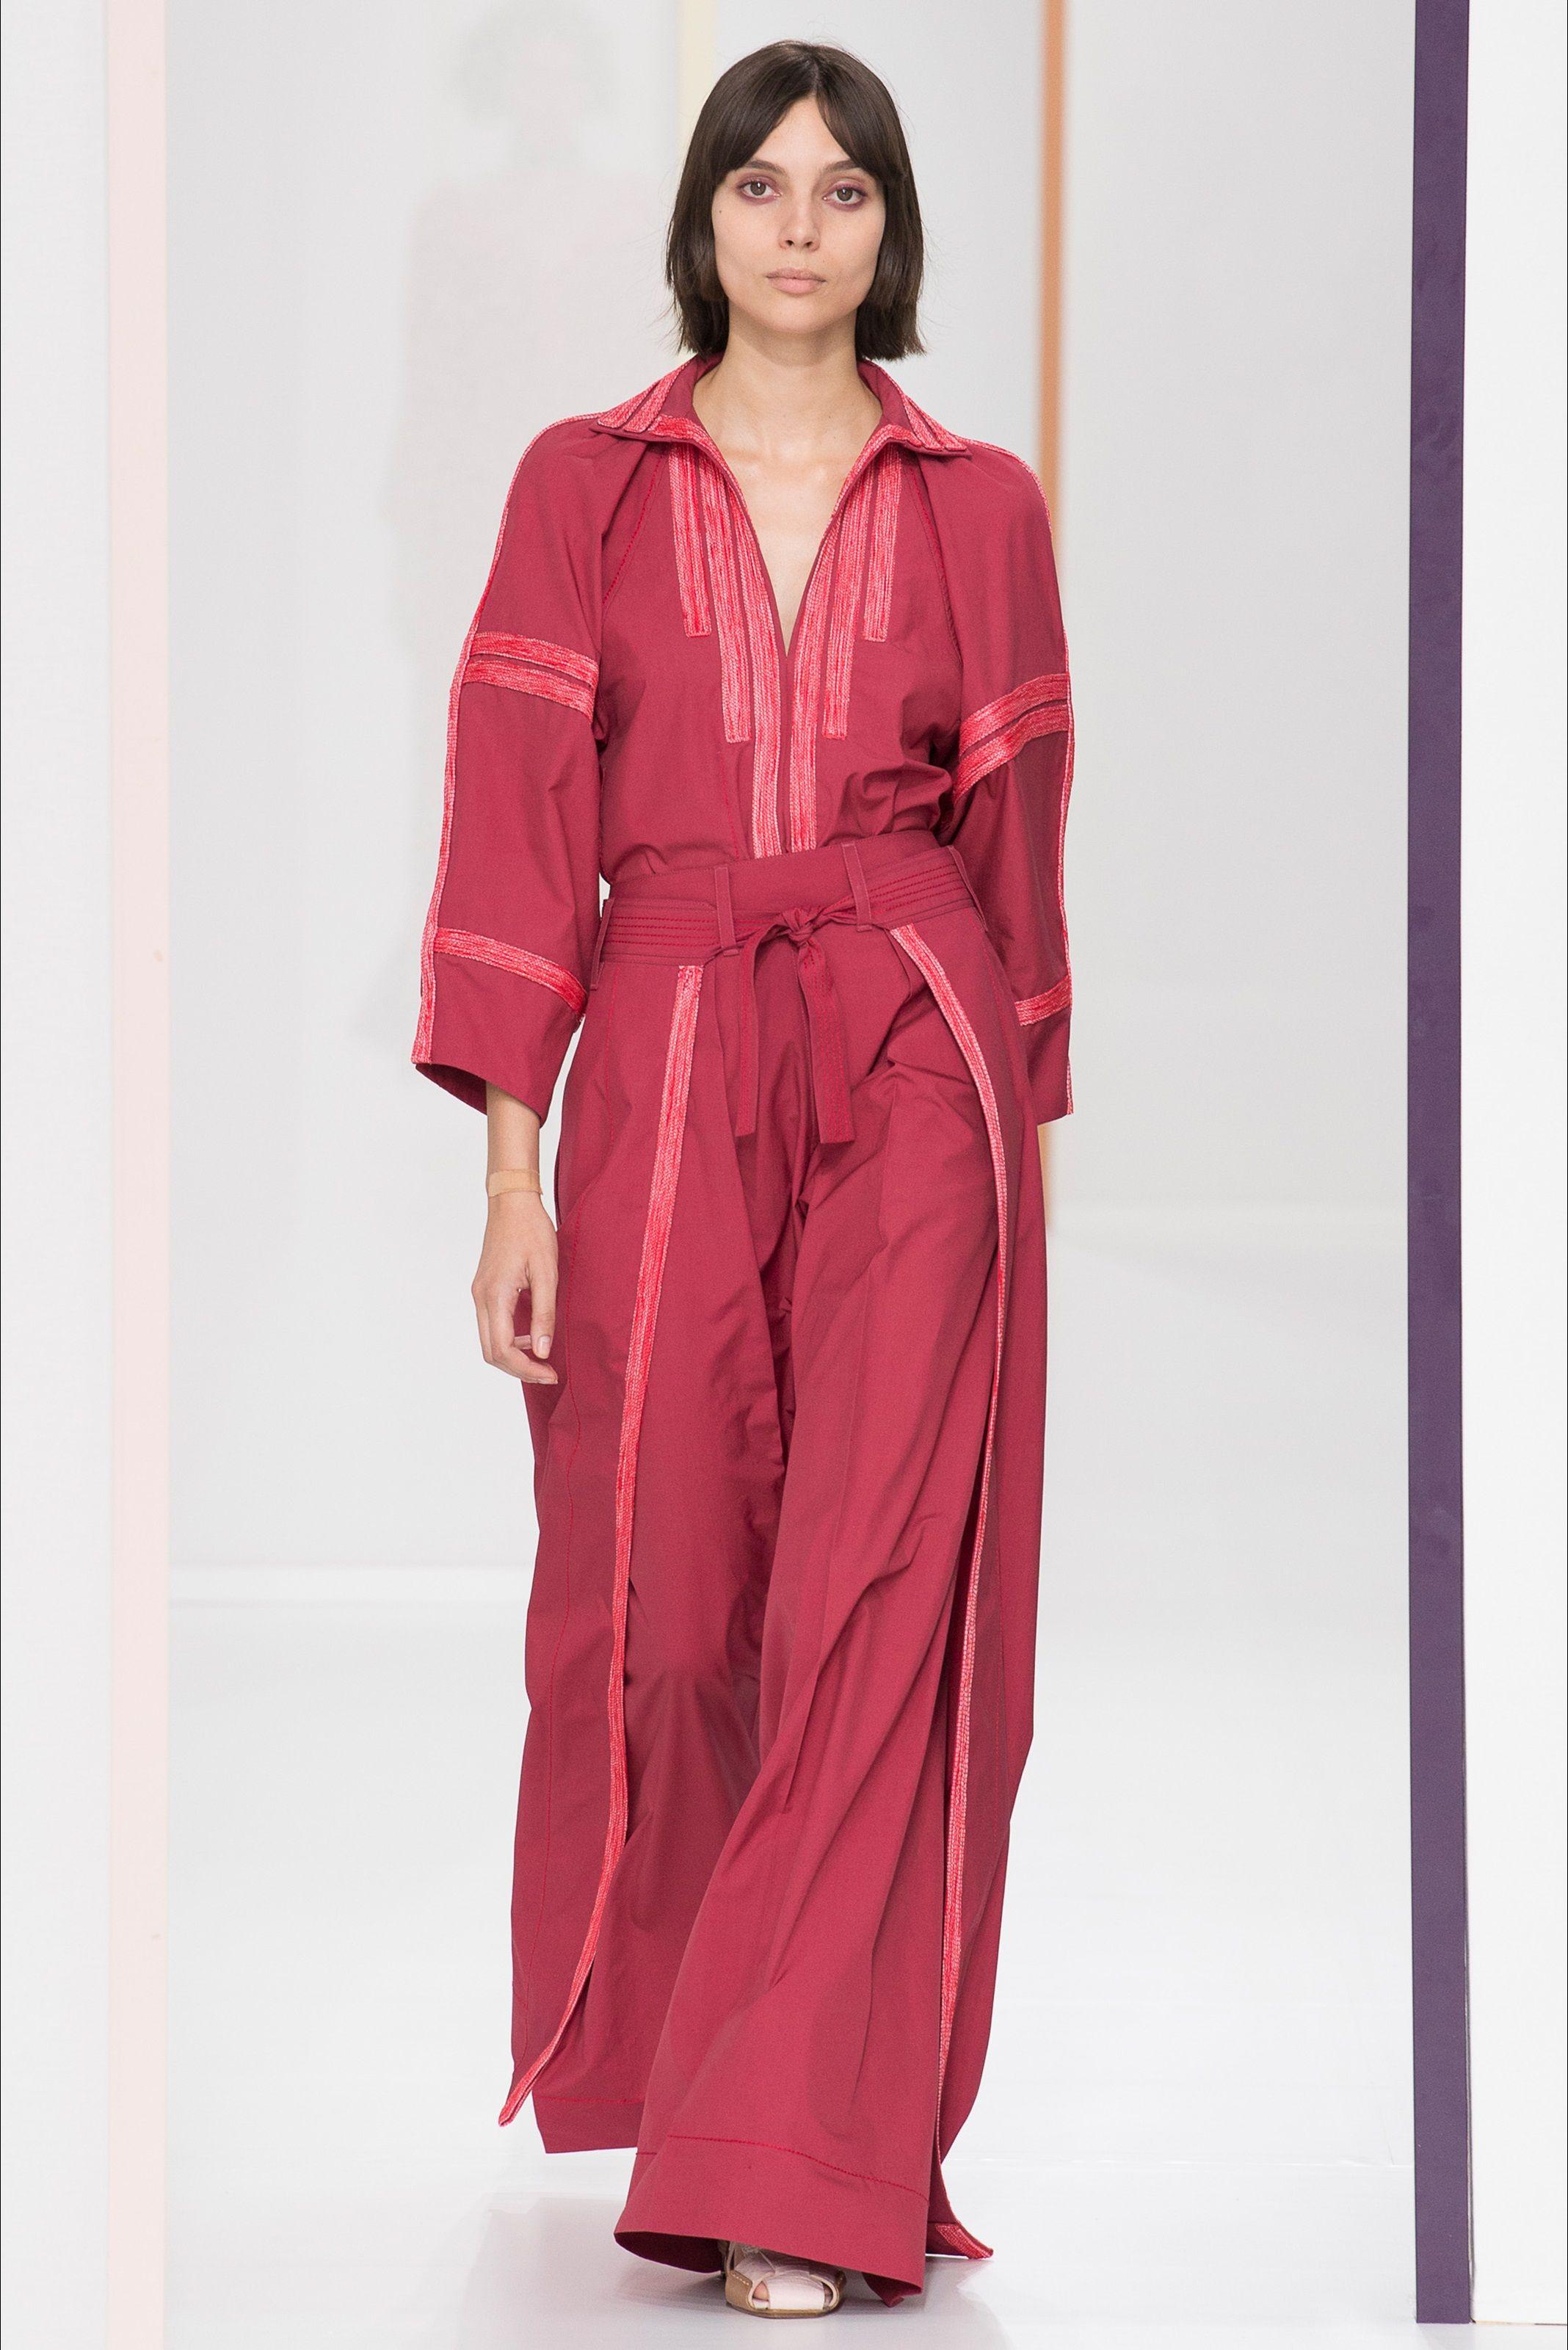 a84f1e981a7 Sfilata Hermès Parigi - Collezioni Primavera Estate 2018 - Vogue ...